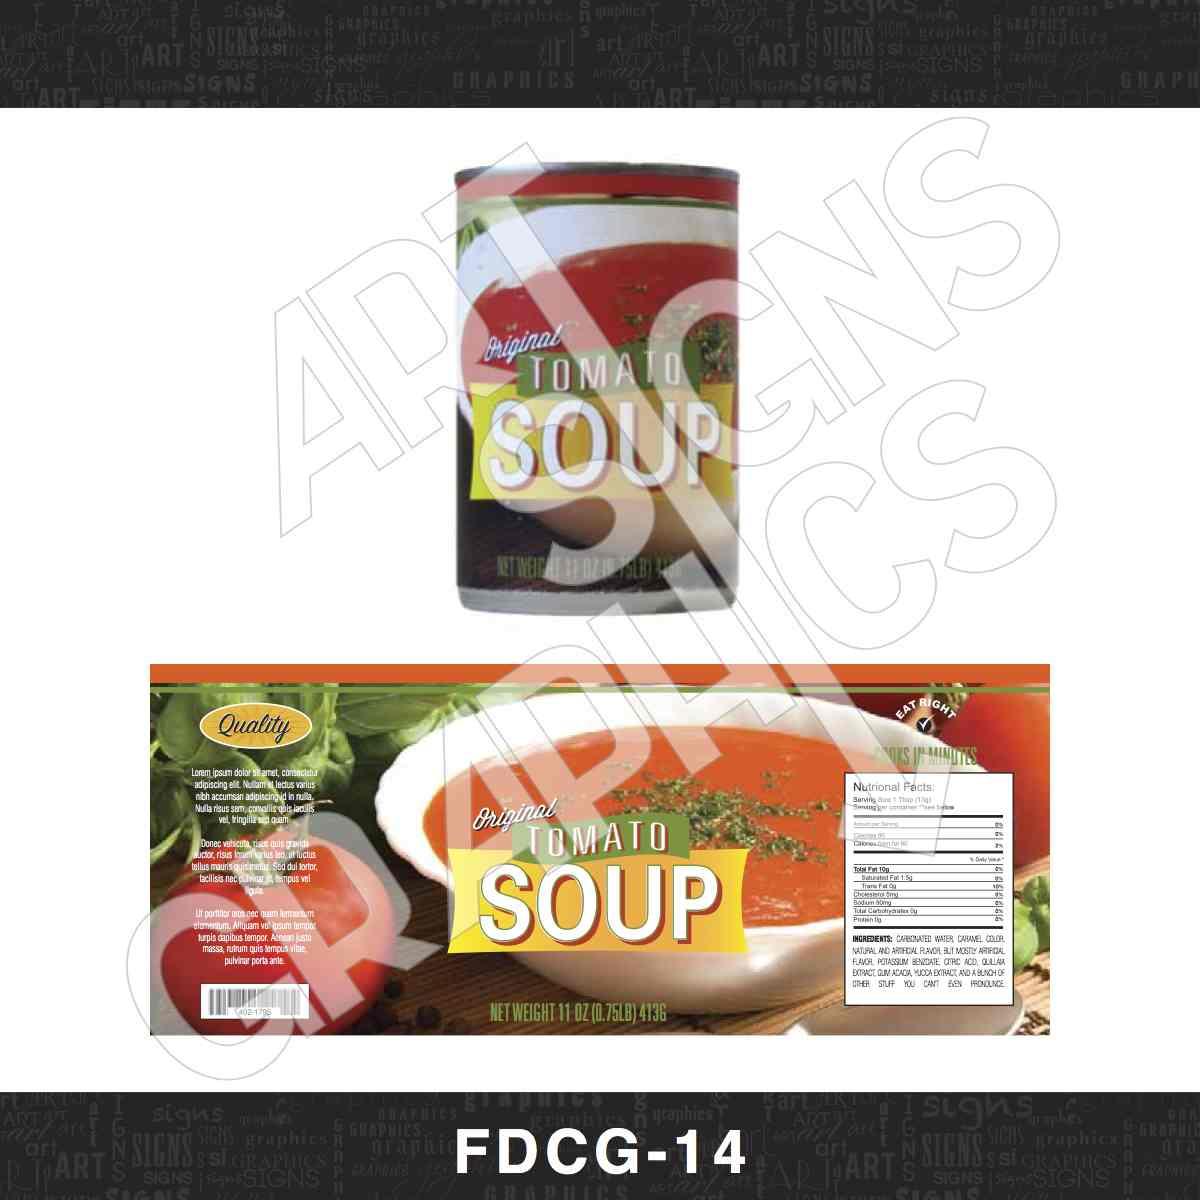 FDCG_14.jpg